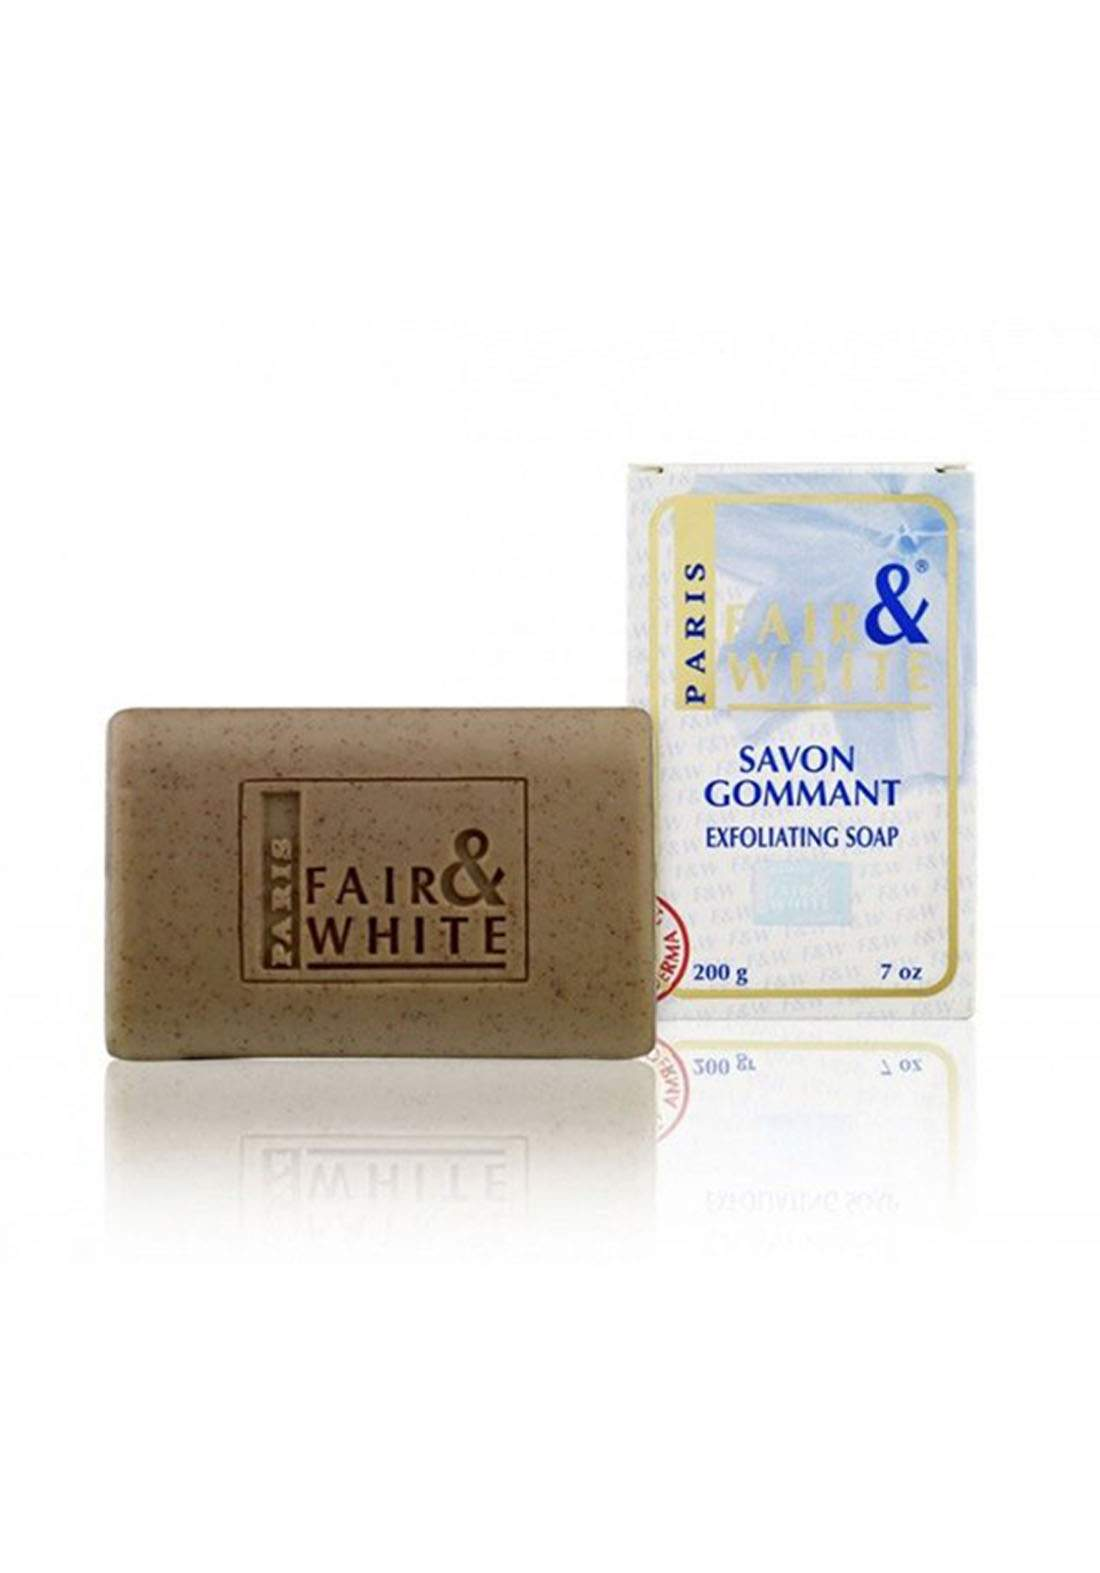 Fair and White Exfoliating Soap - 200g صابون تقشير البشرة